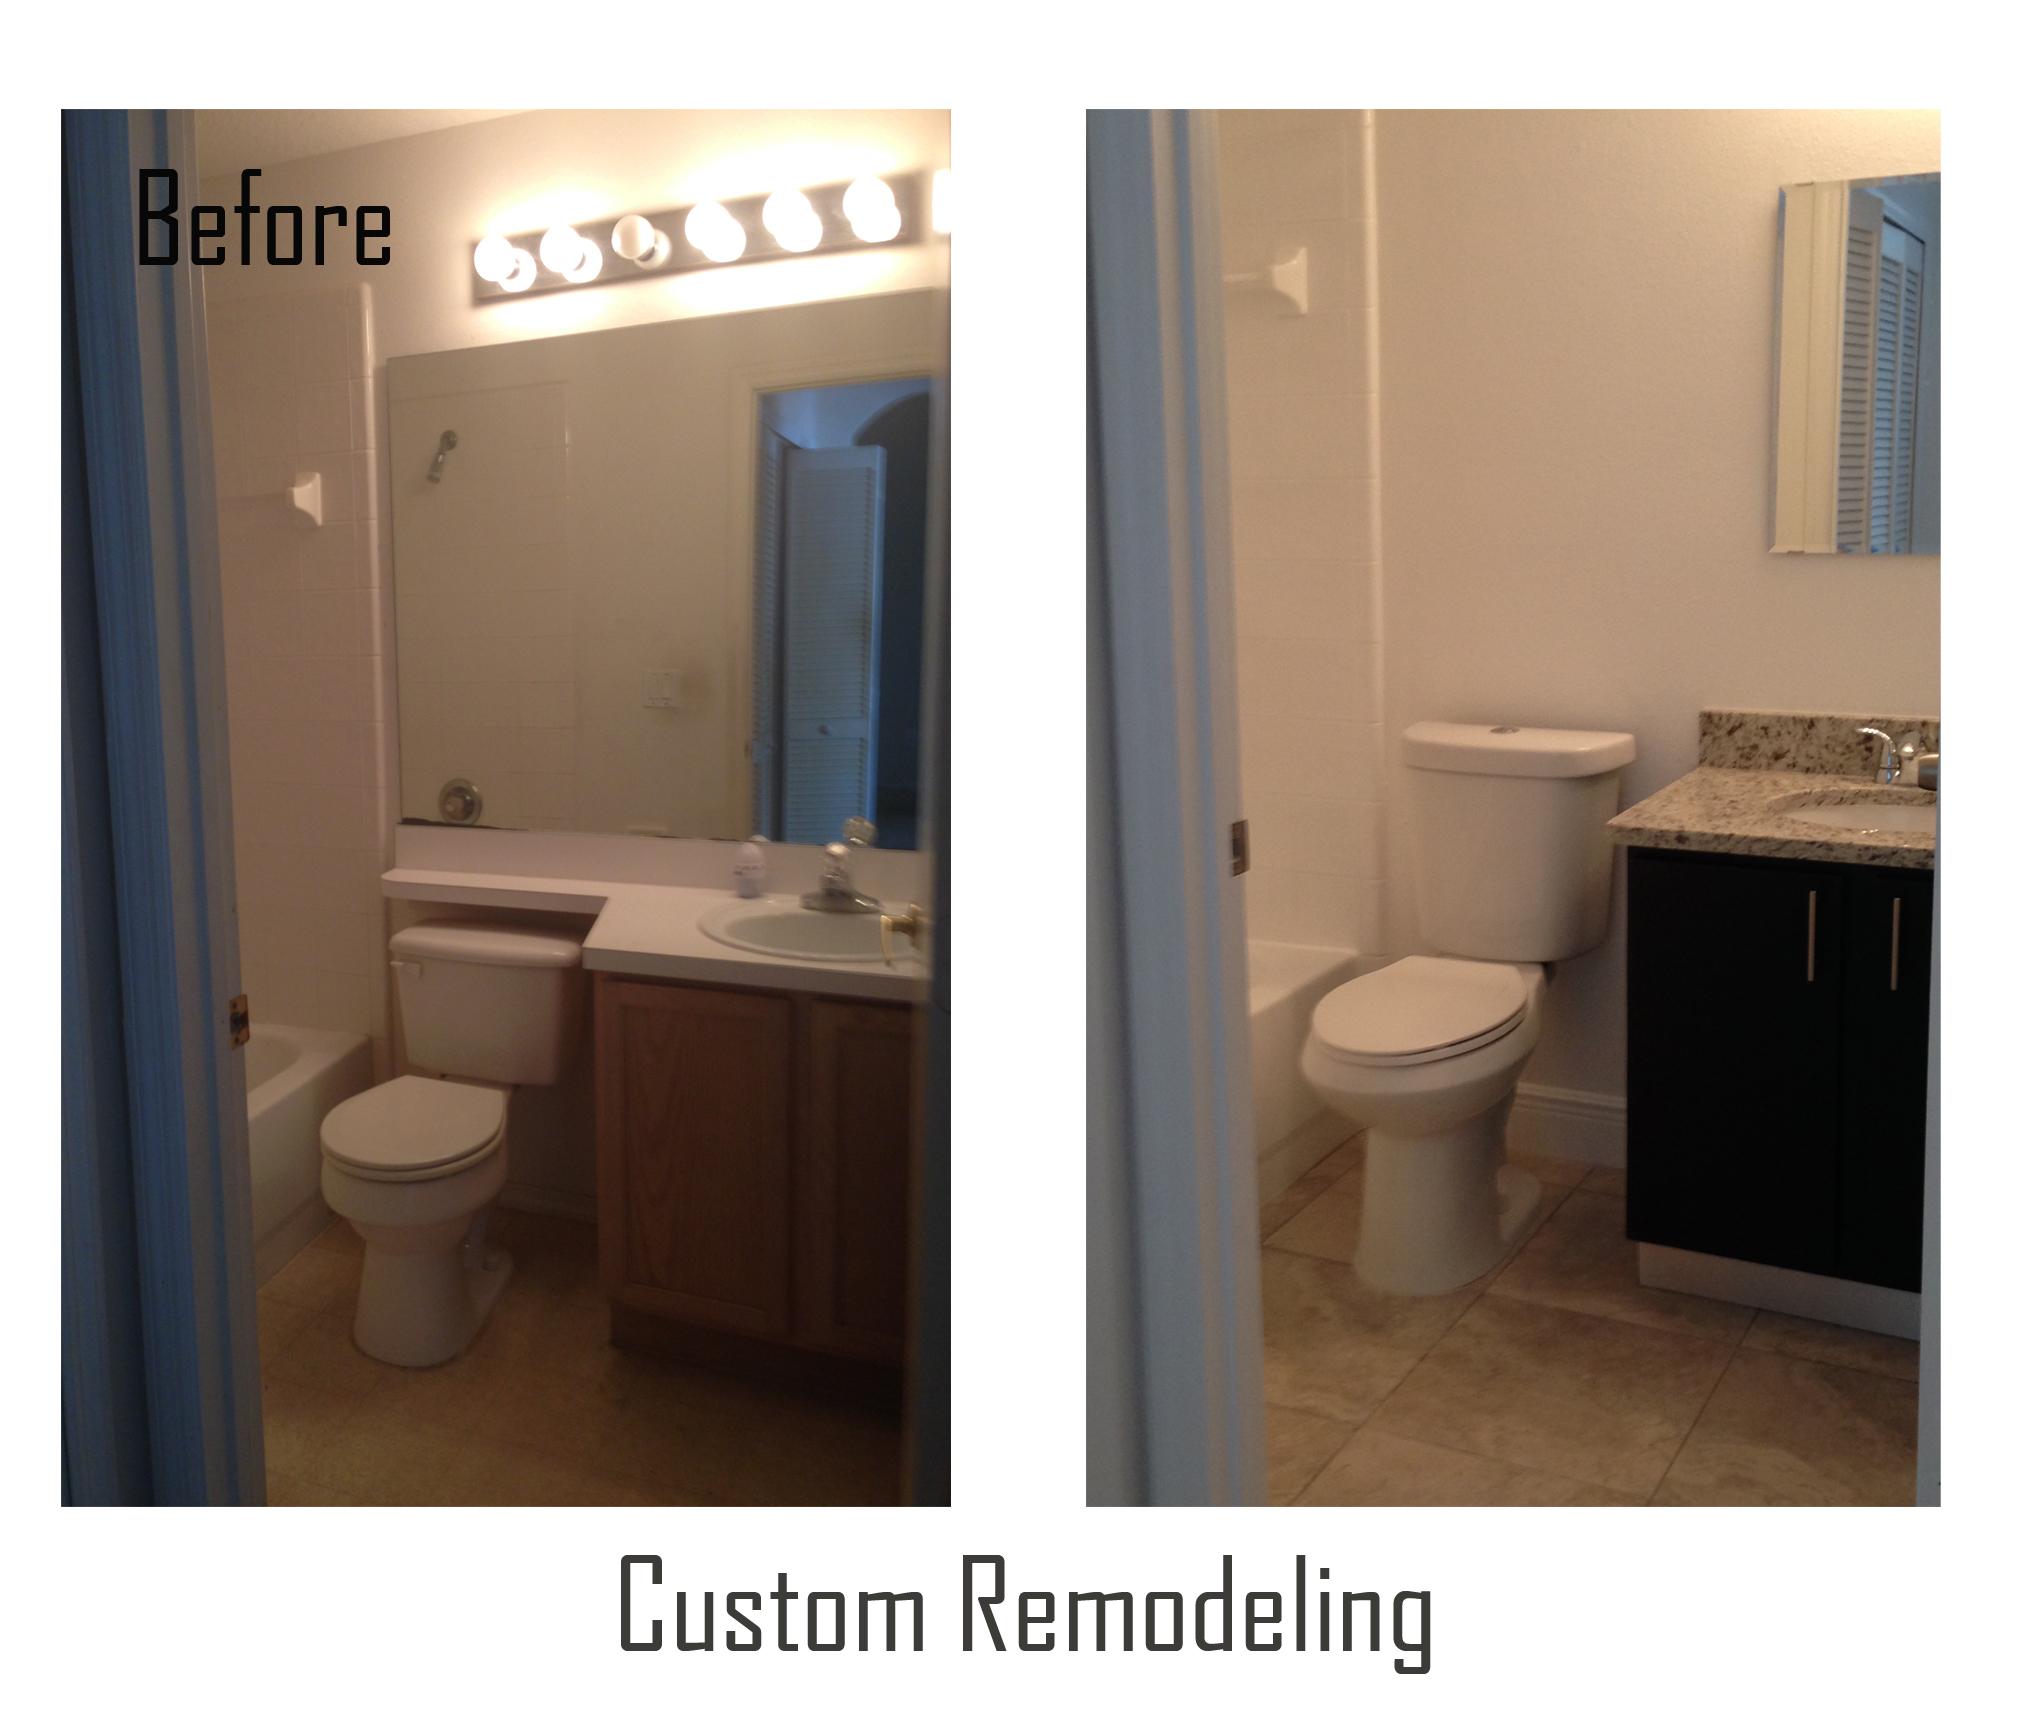 Custom Remodeling